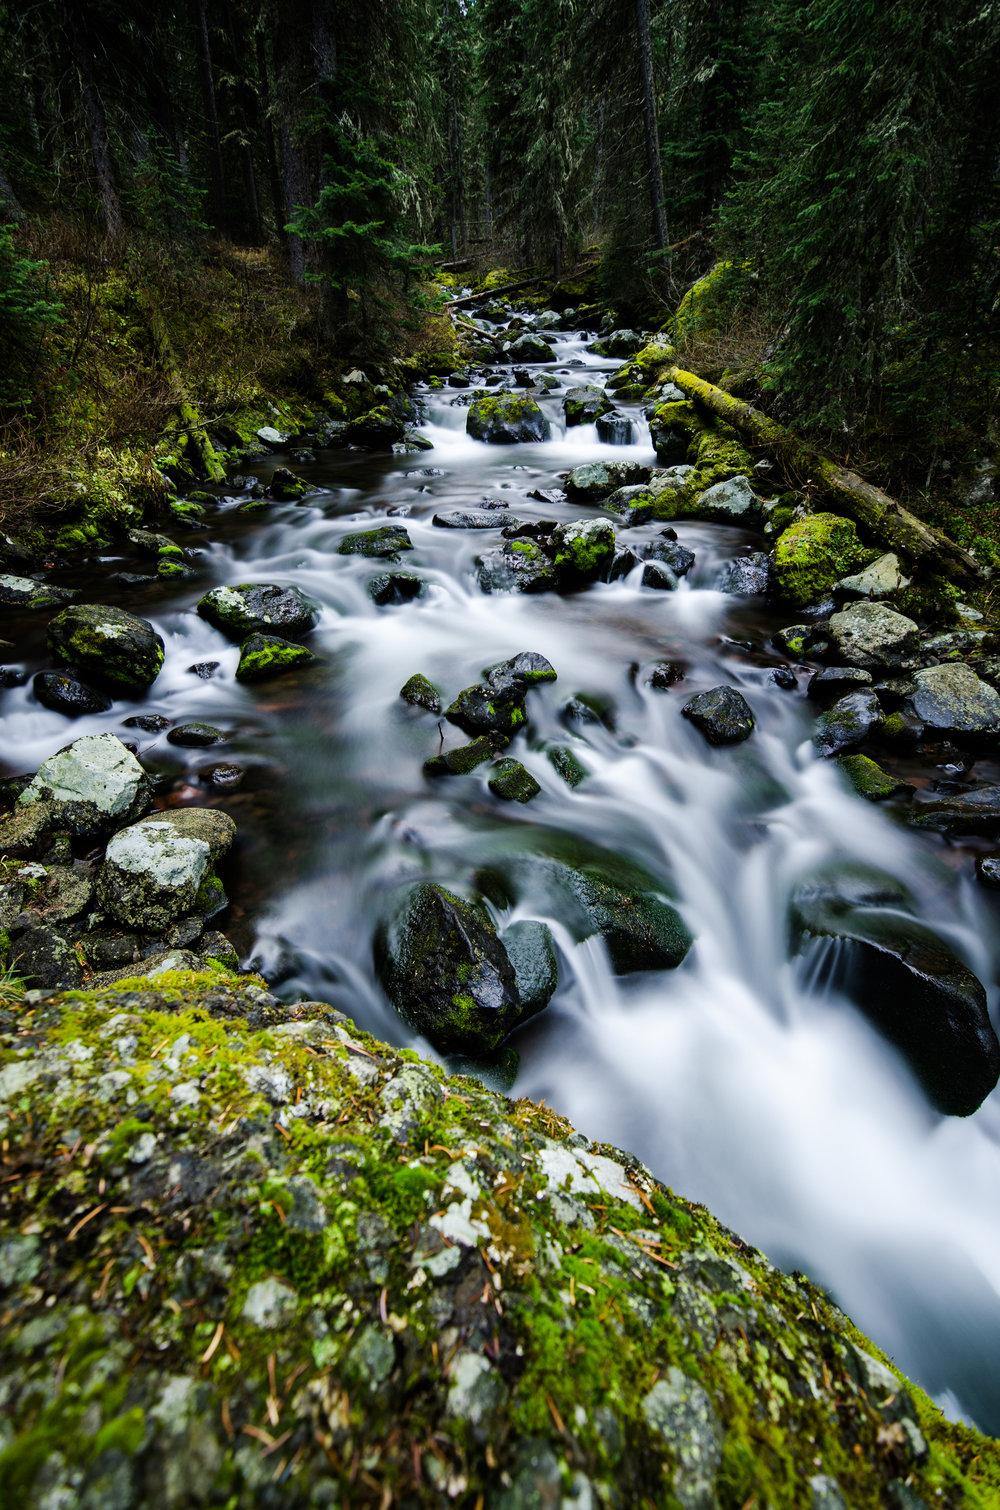 Creek runs through it